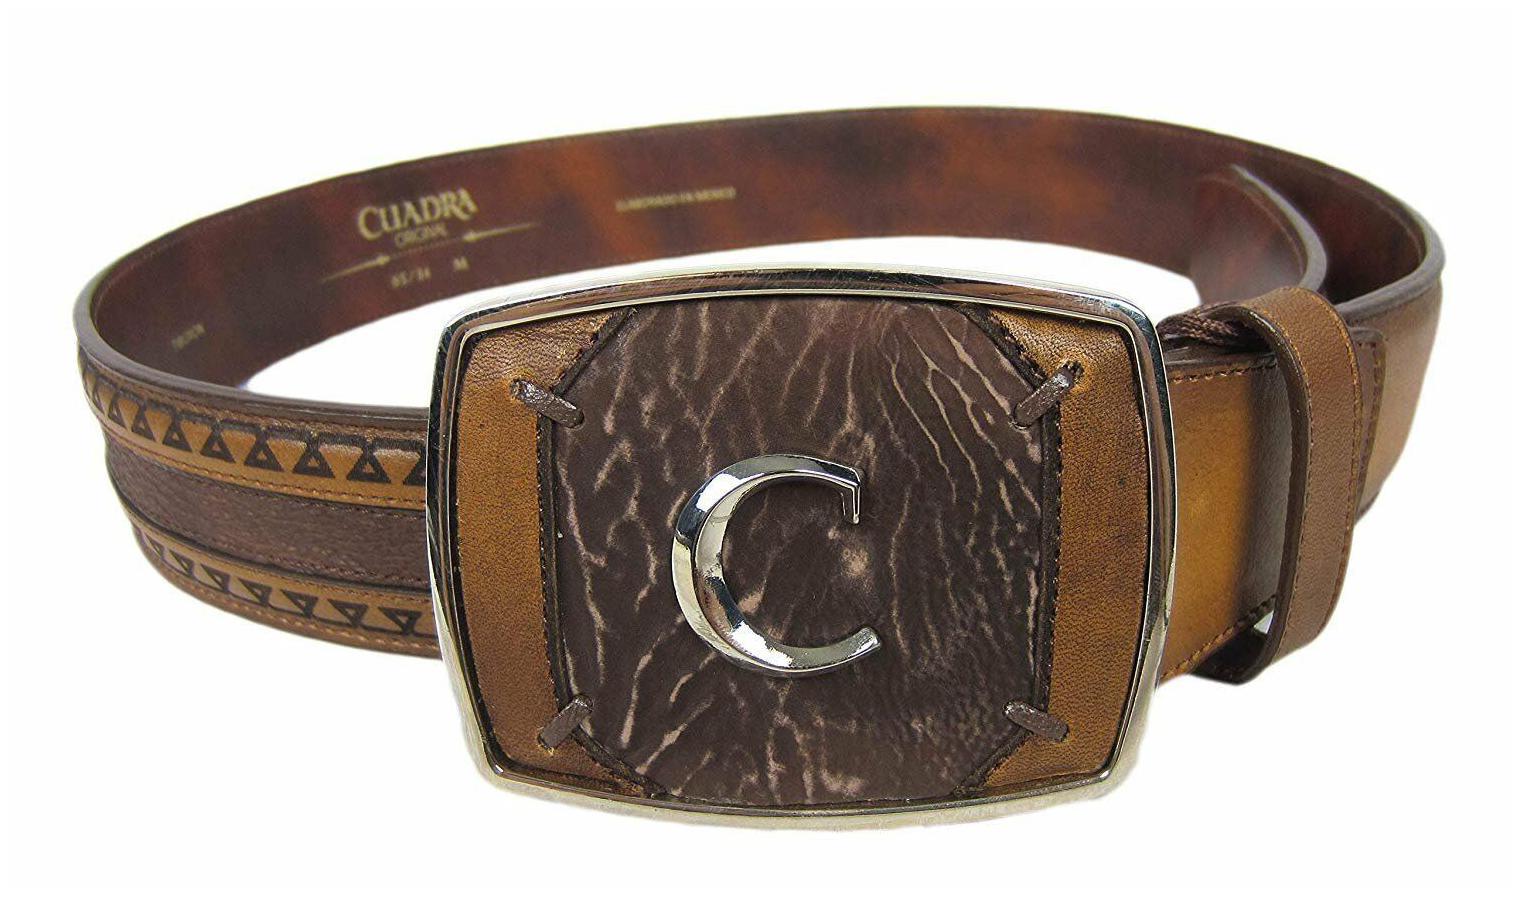 CVT21FP CVT21A1 Genuine Ostrich or Crocodile Cuadra Men Belt